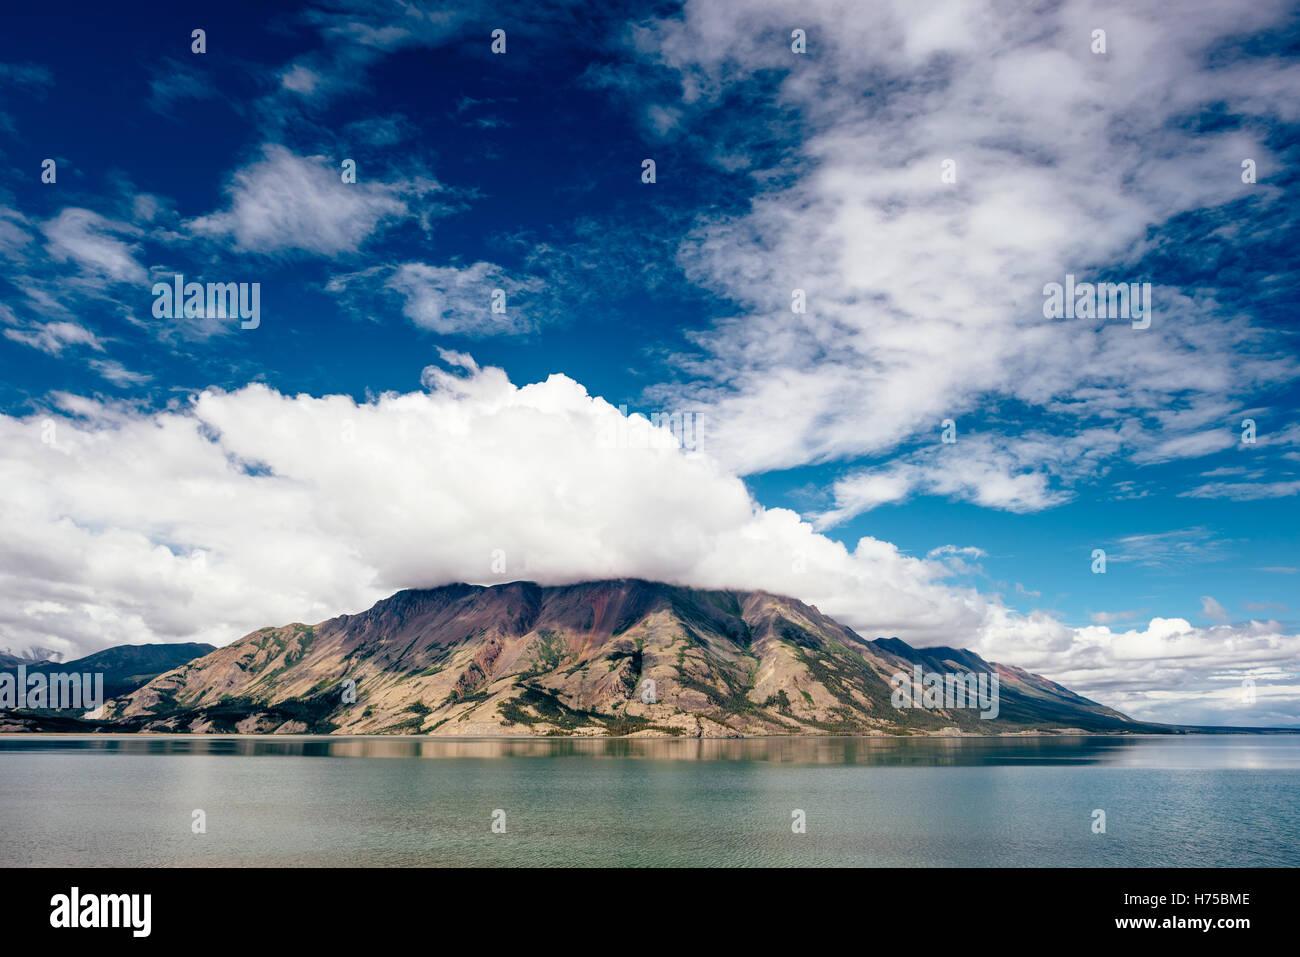 Kluane Lake in Yukon Territory, Canada - Stock Image